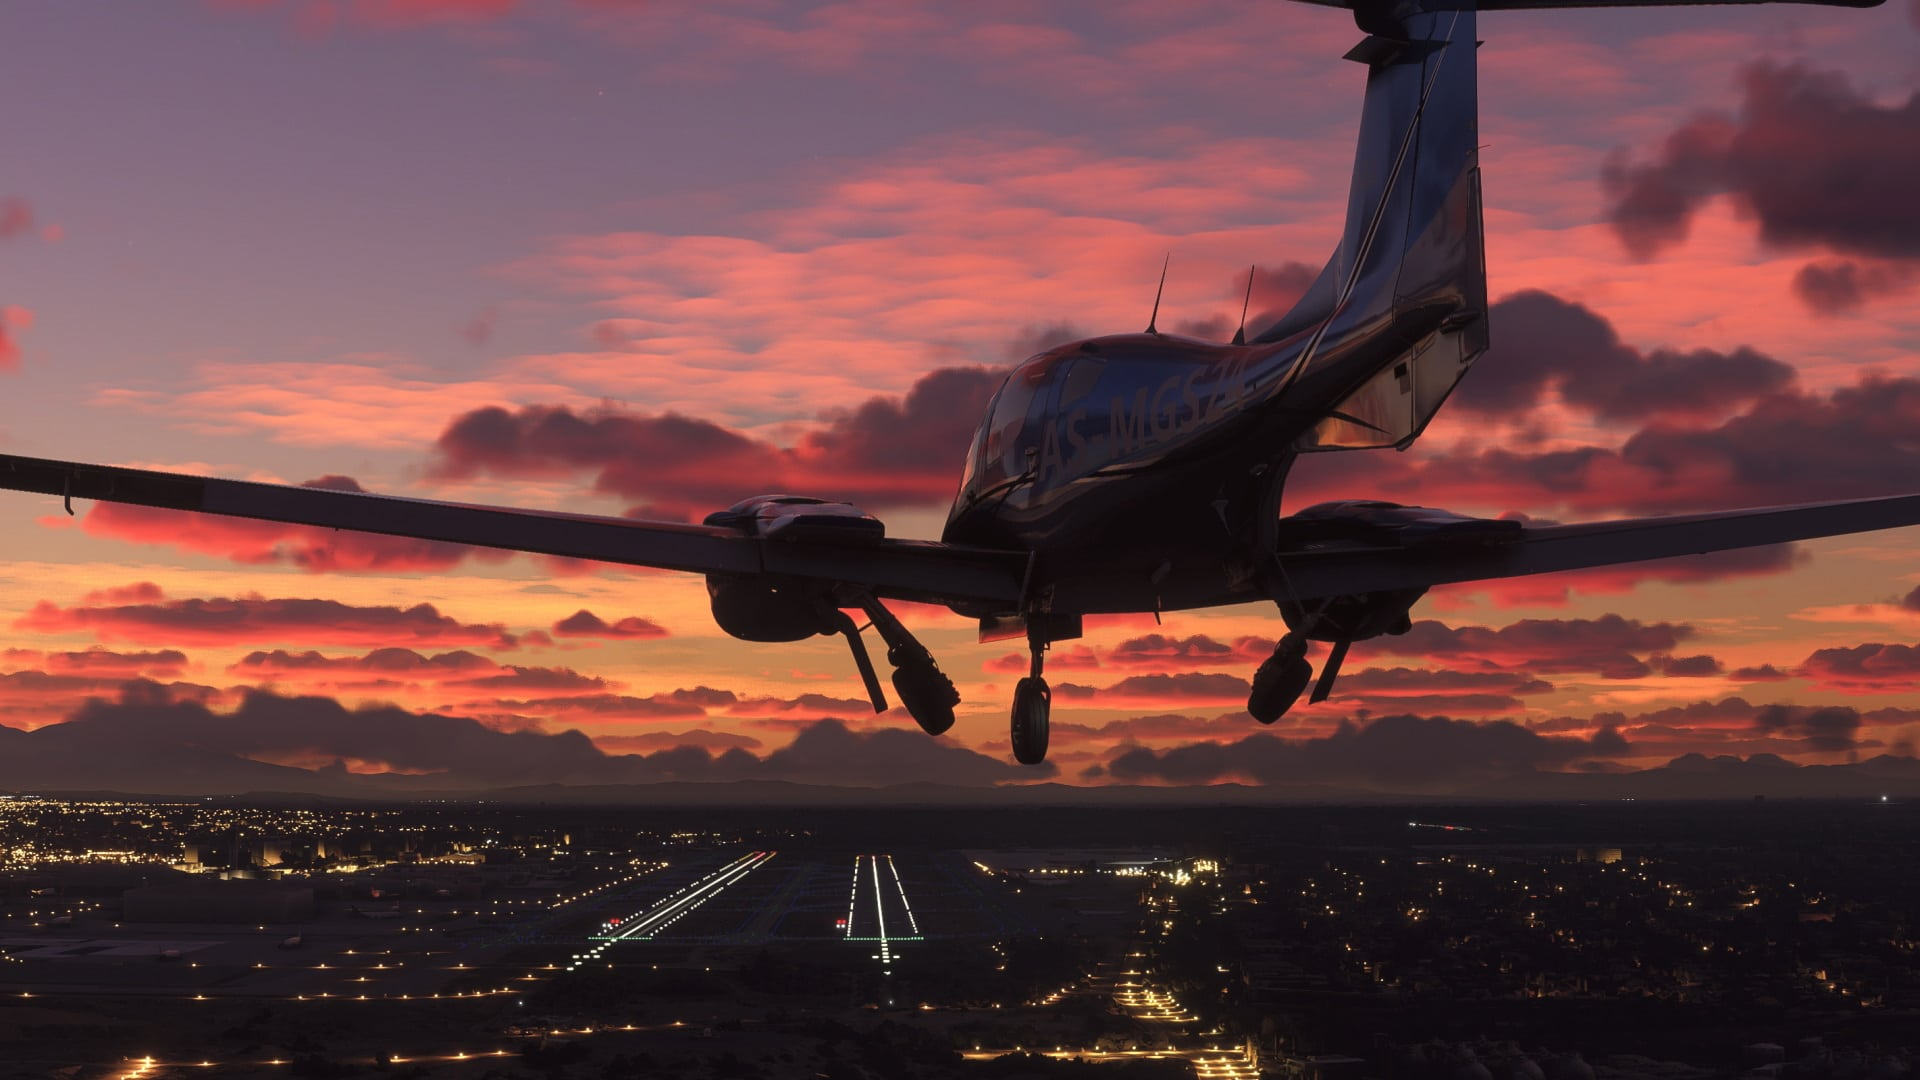 Microsoft Flight Simulator 2020 Poster